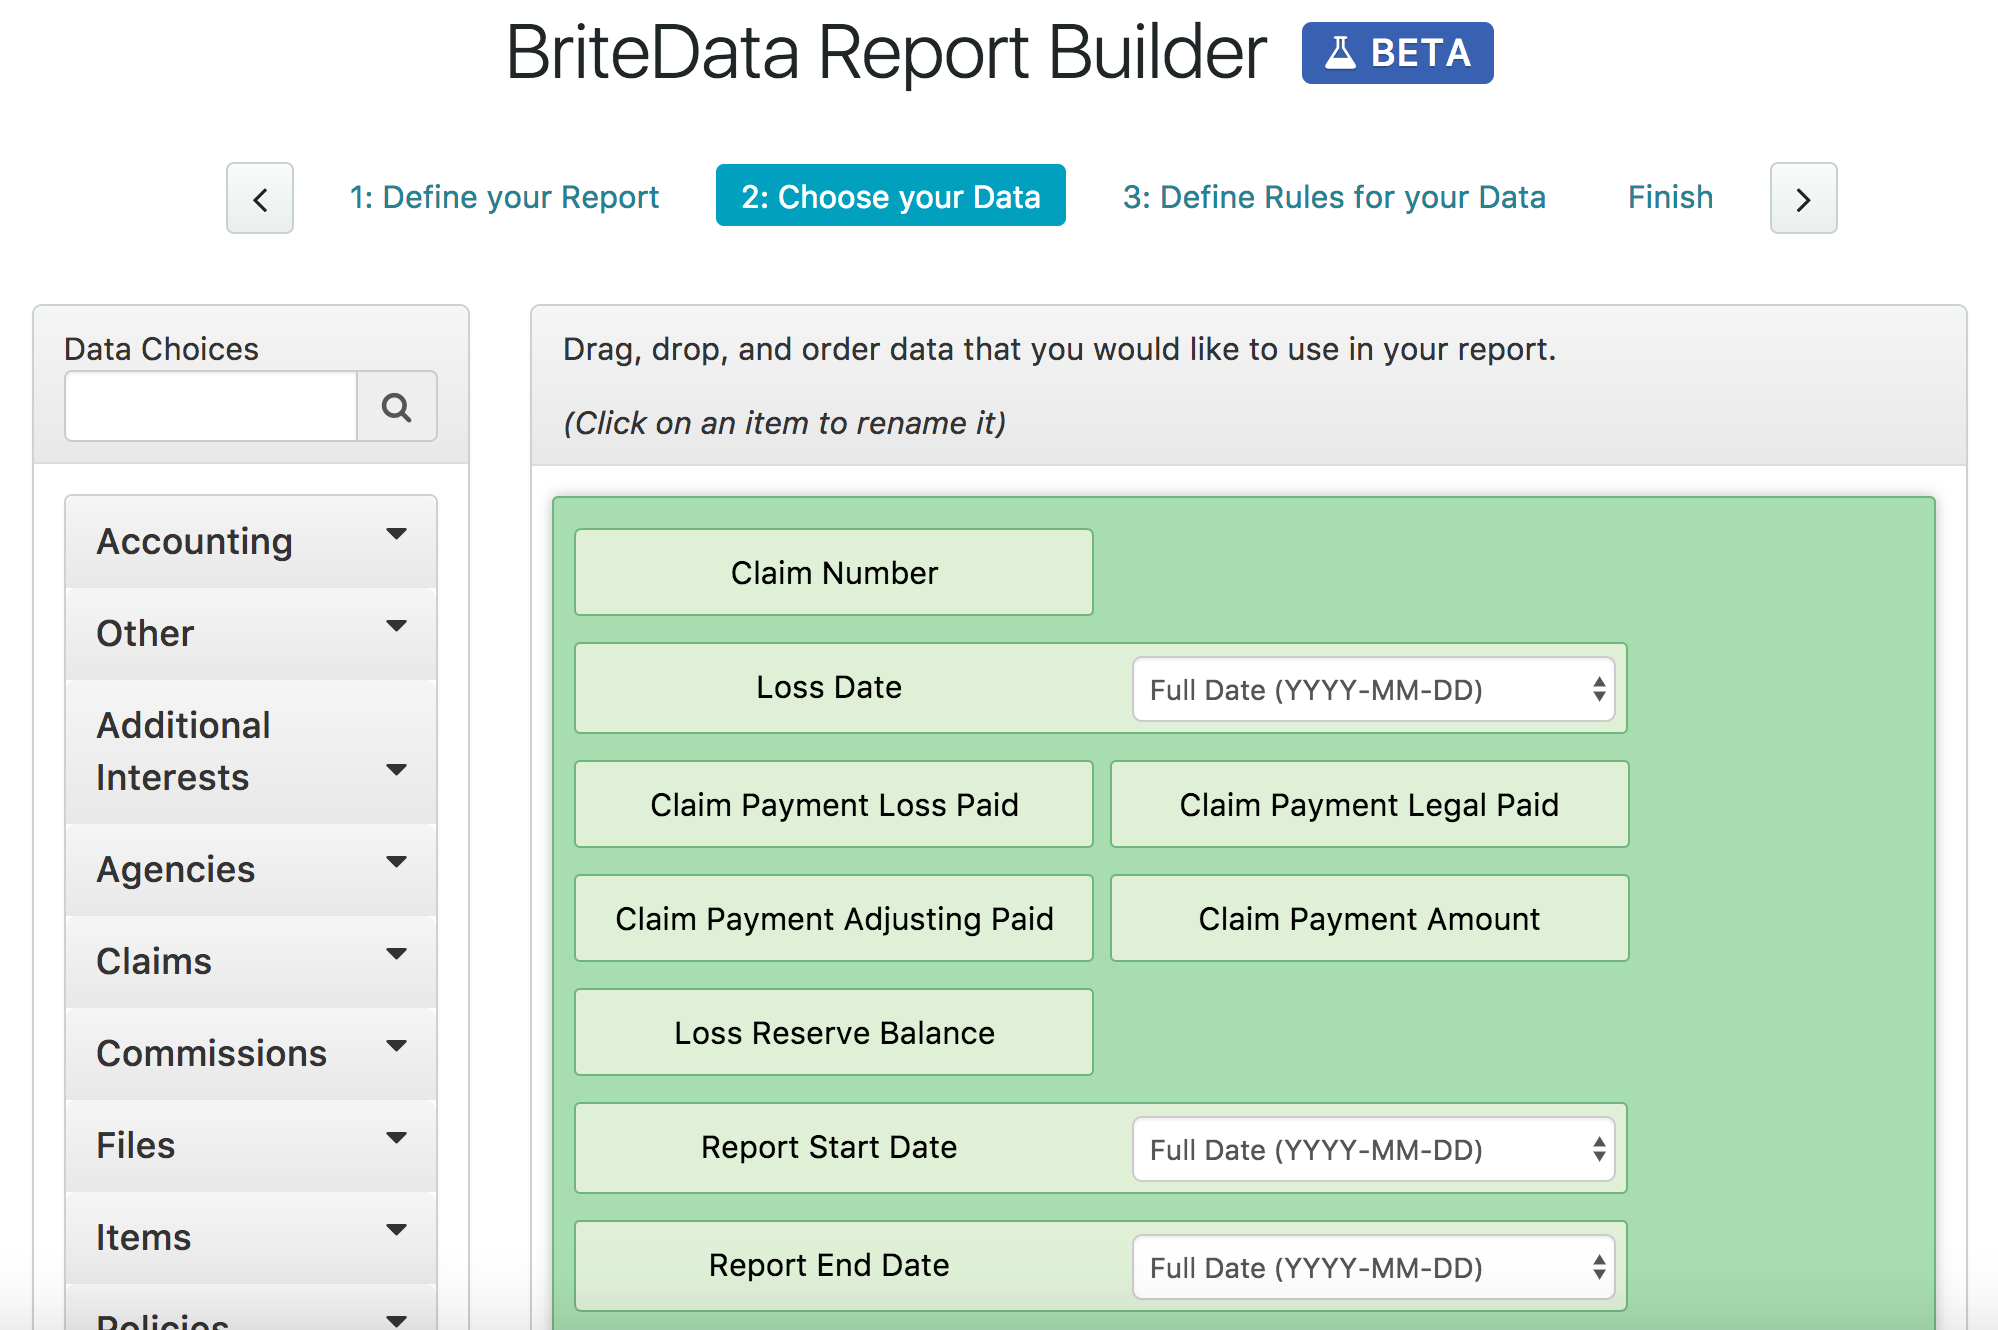 BriteCore Demo - Build Customized Reports With BriteData